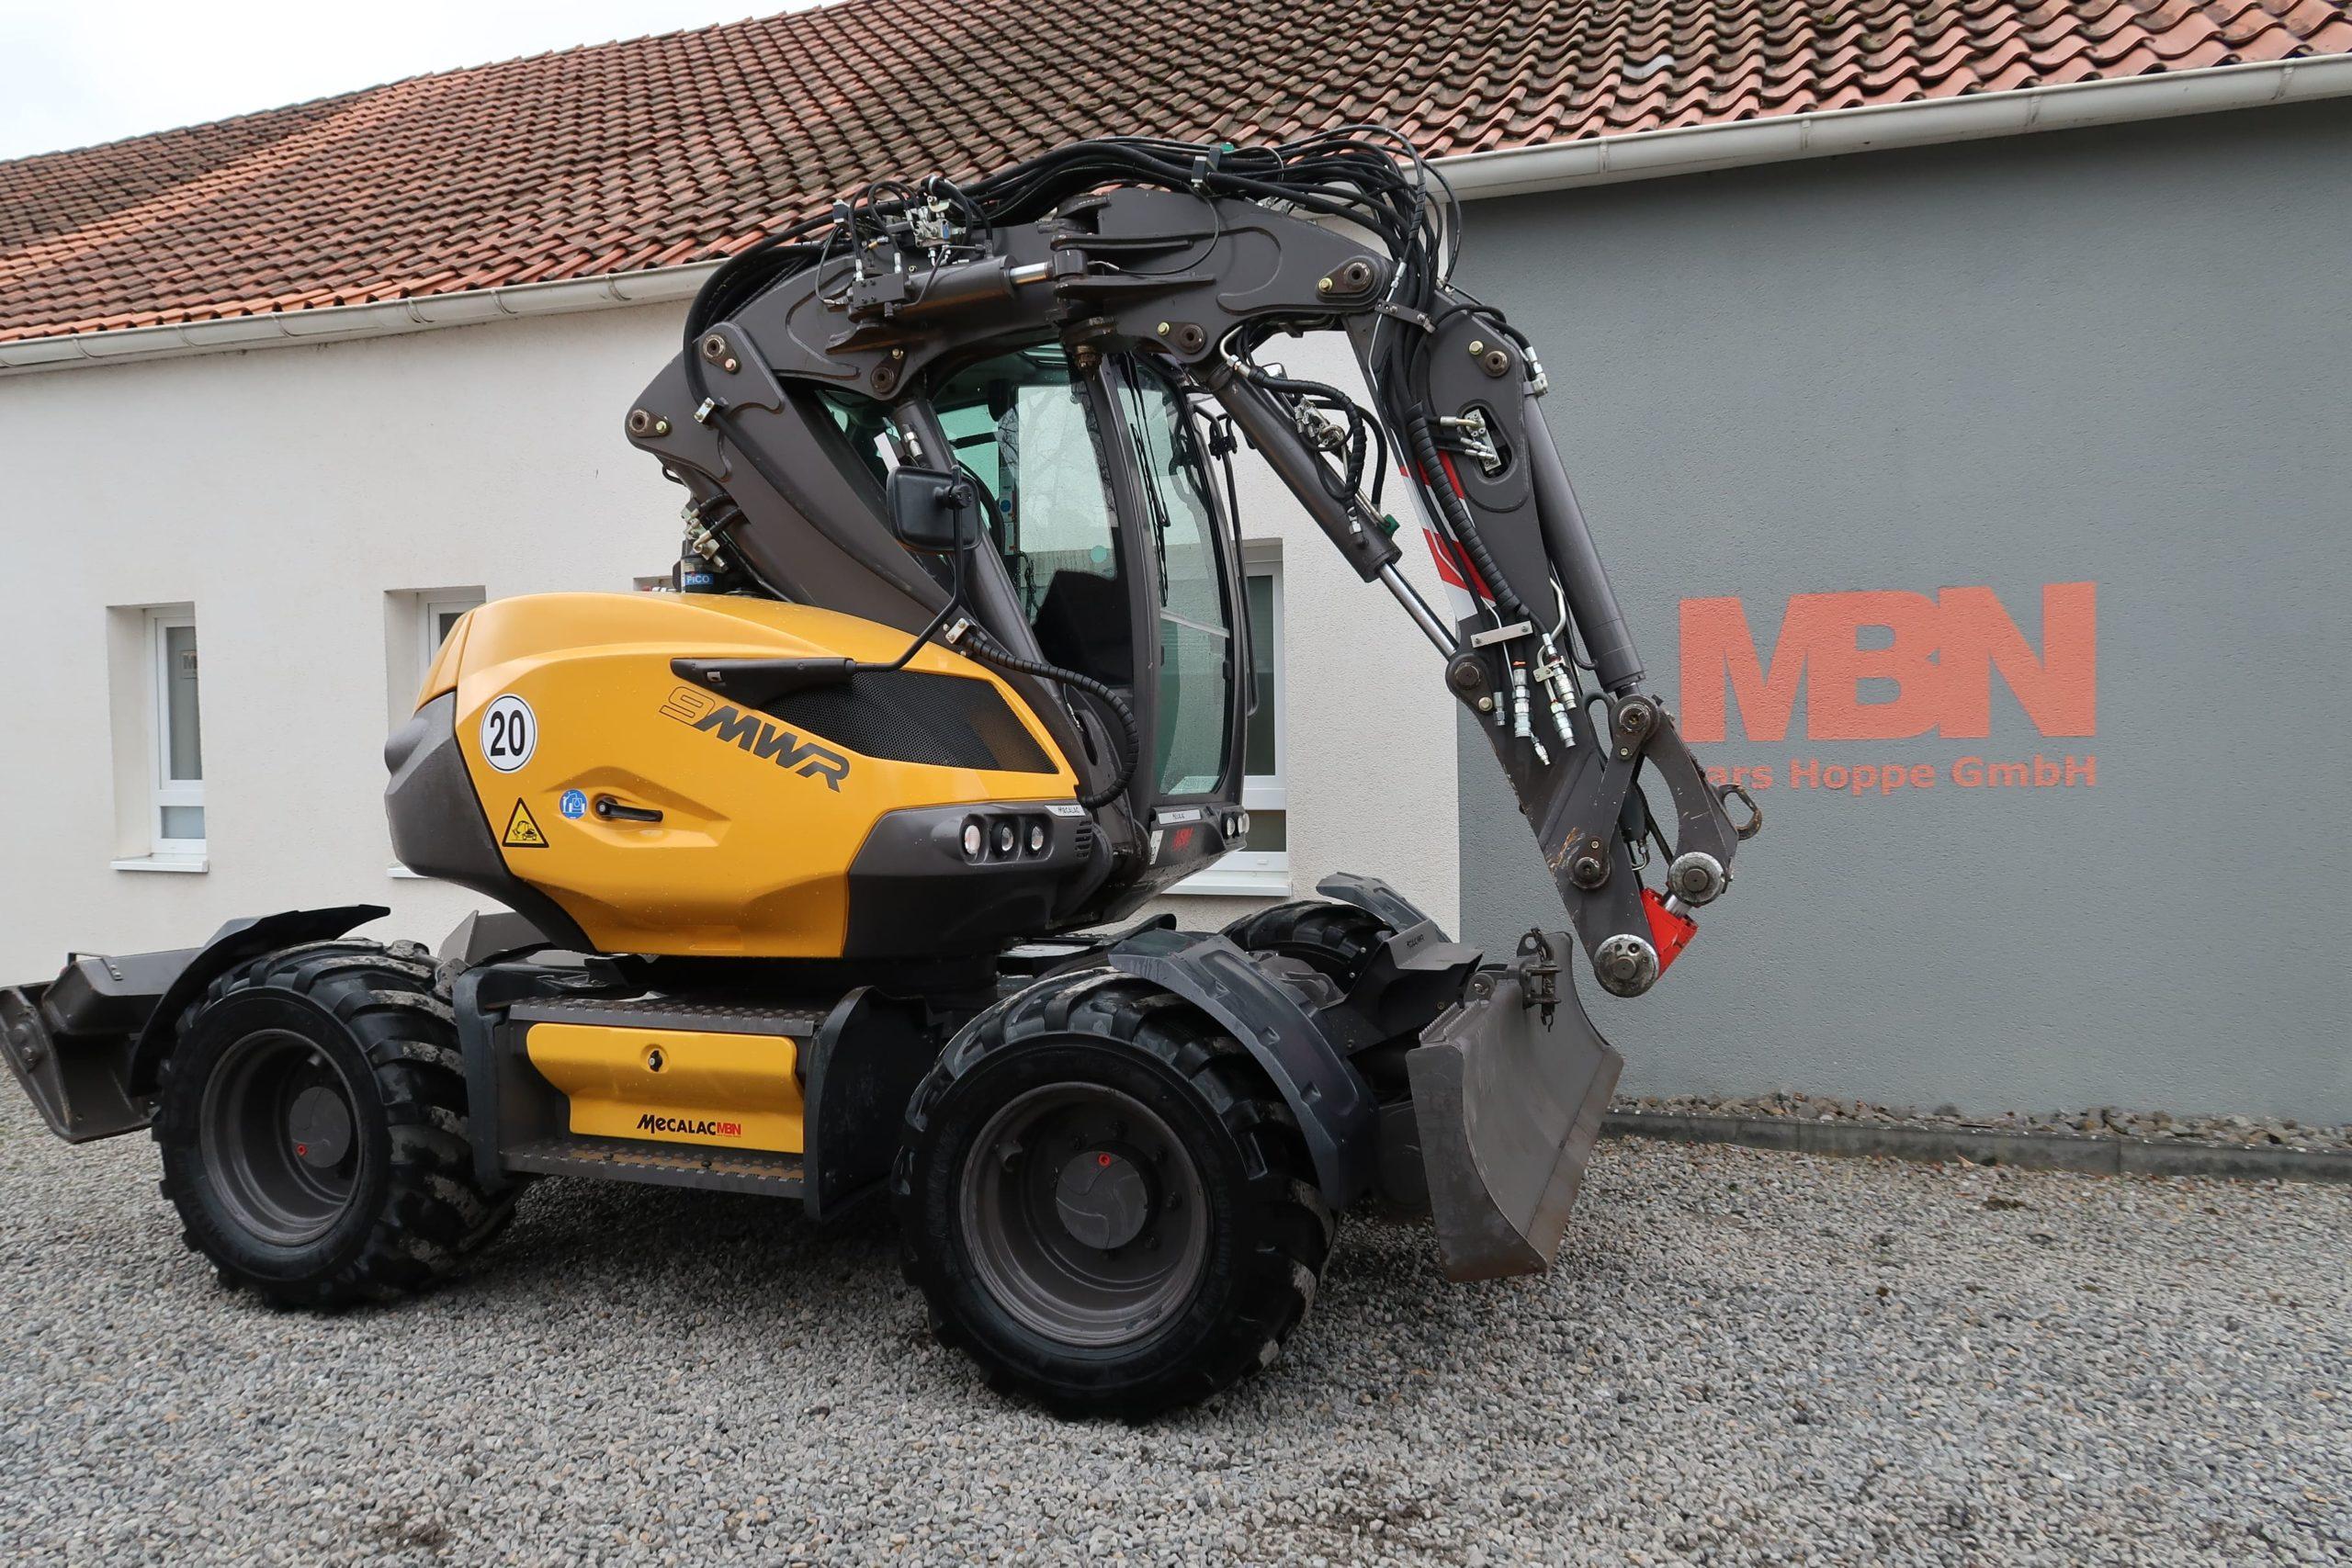 Mecalac_9MWR_Mobilbagger_excavator_Bagger_MBN_gebraucht_kaufen_Stadthagen_Hoppe